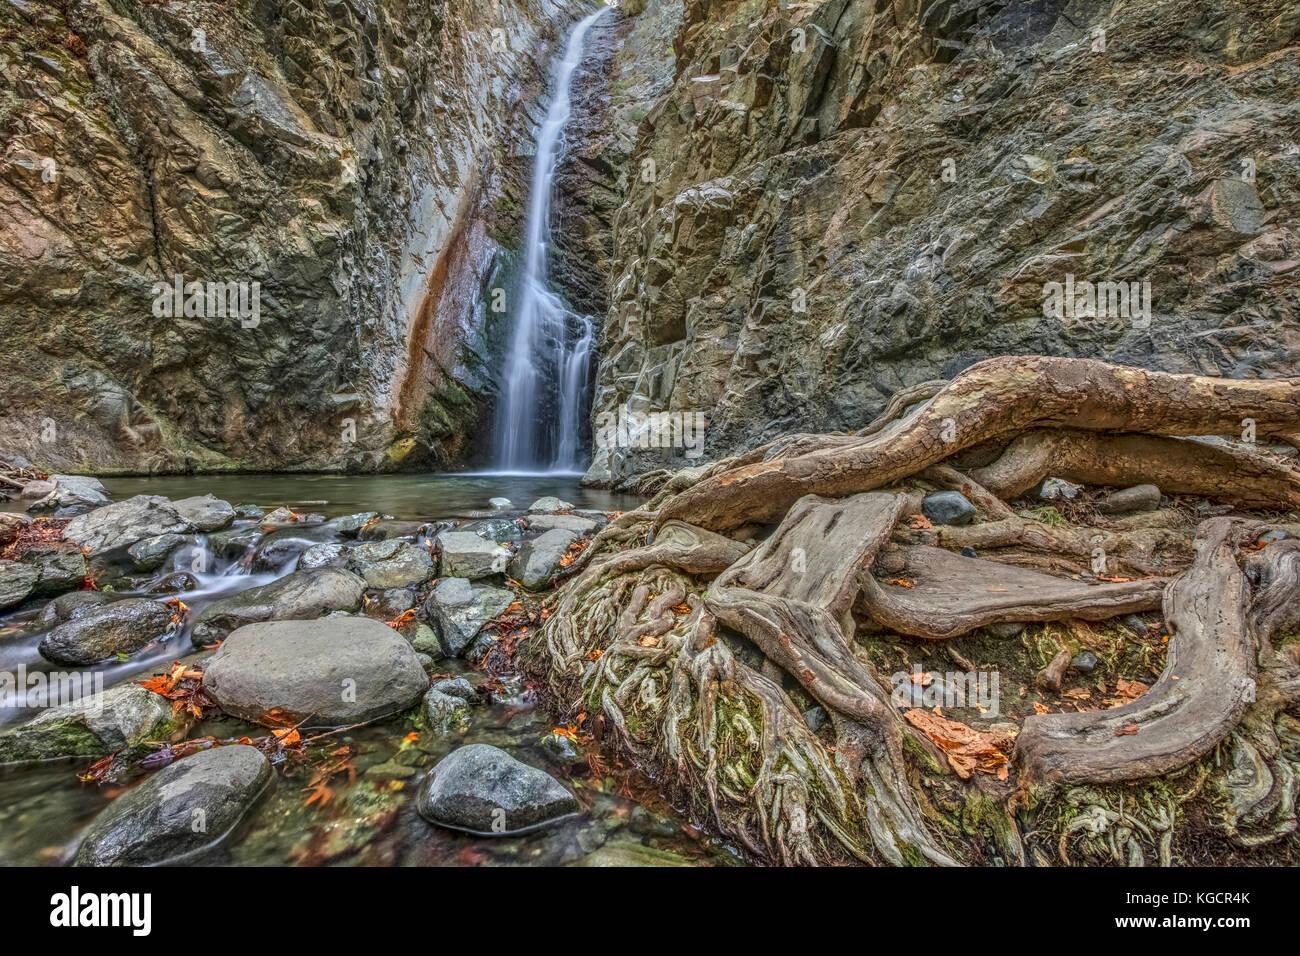 Millomeris Waterfall, Pano Platres, Limassol, Cyprus - Stock Image